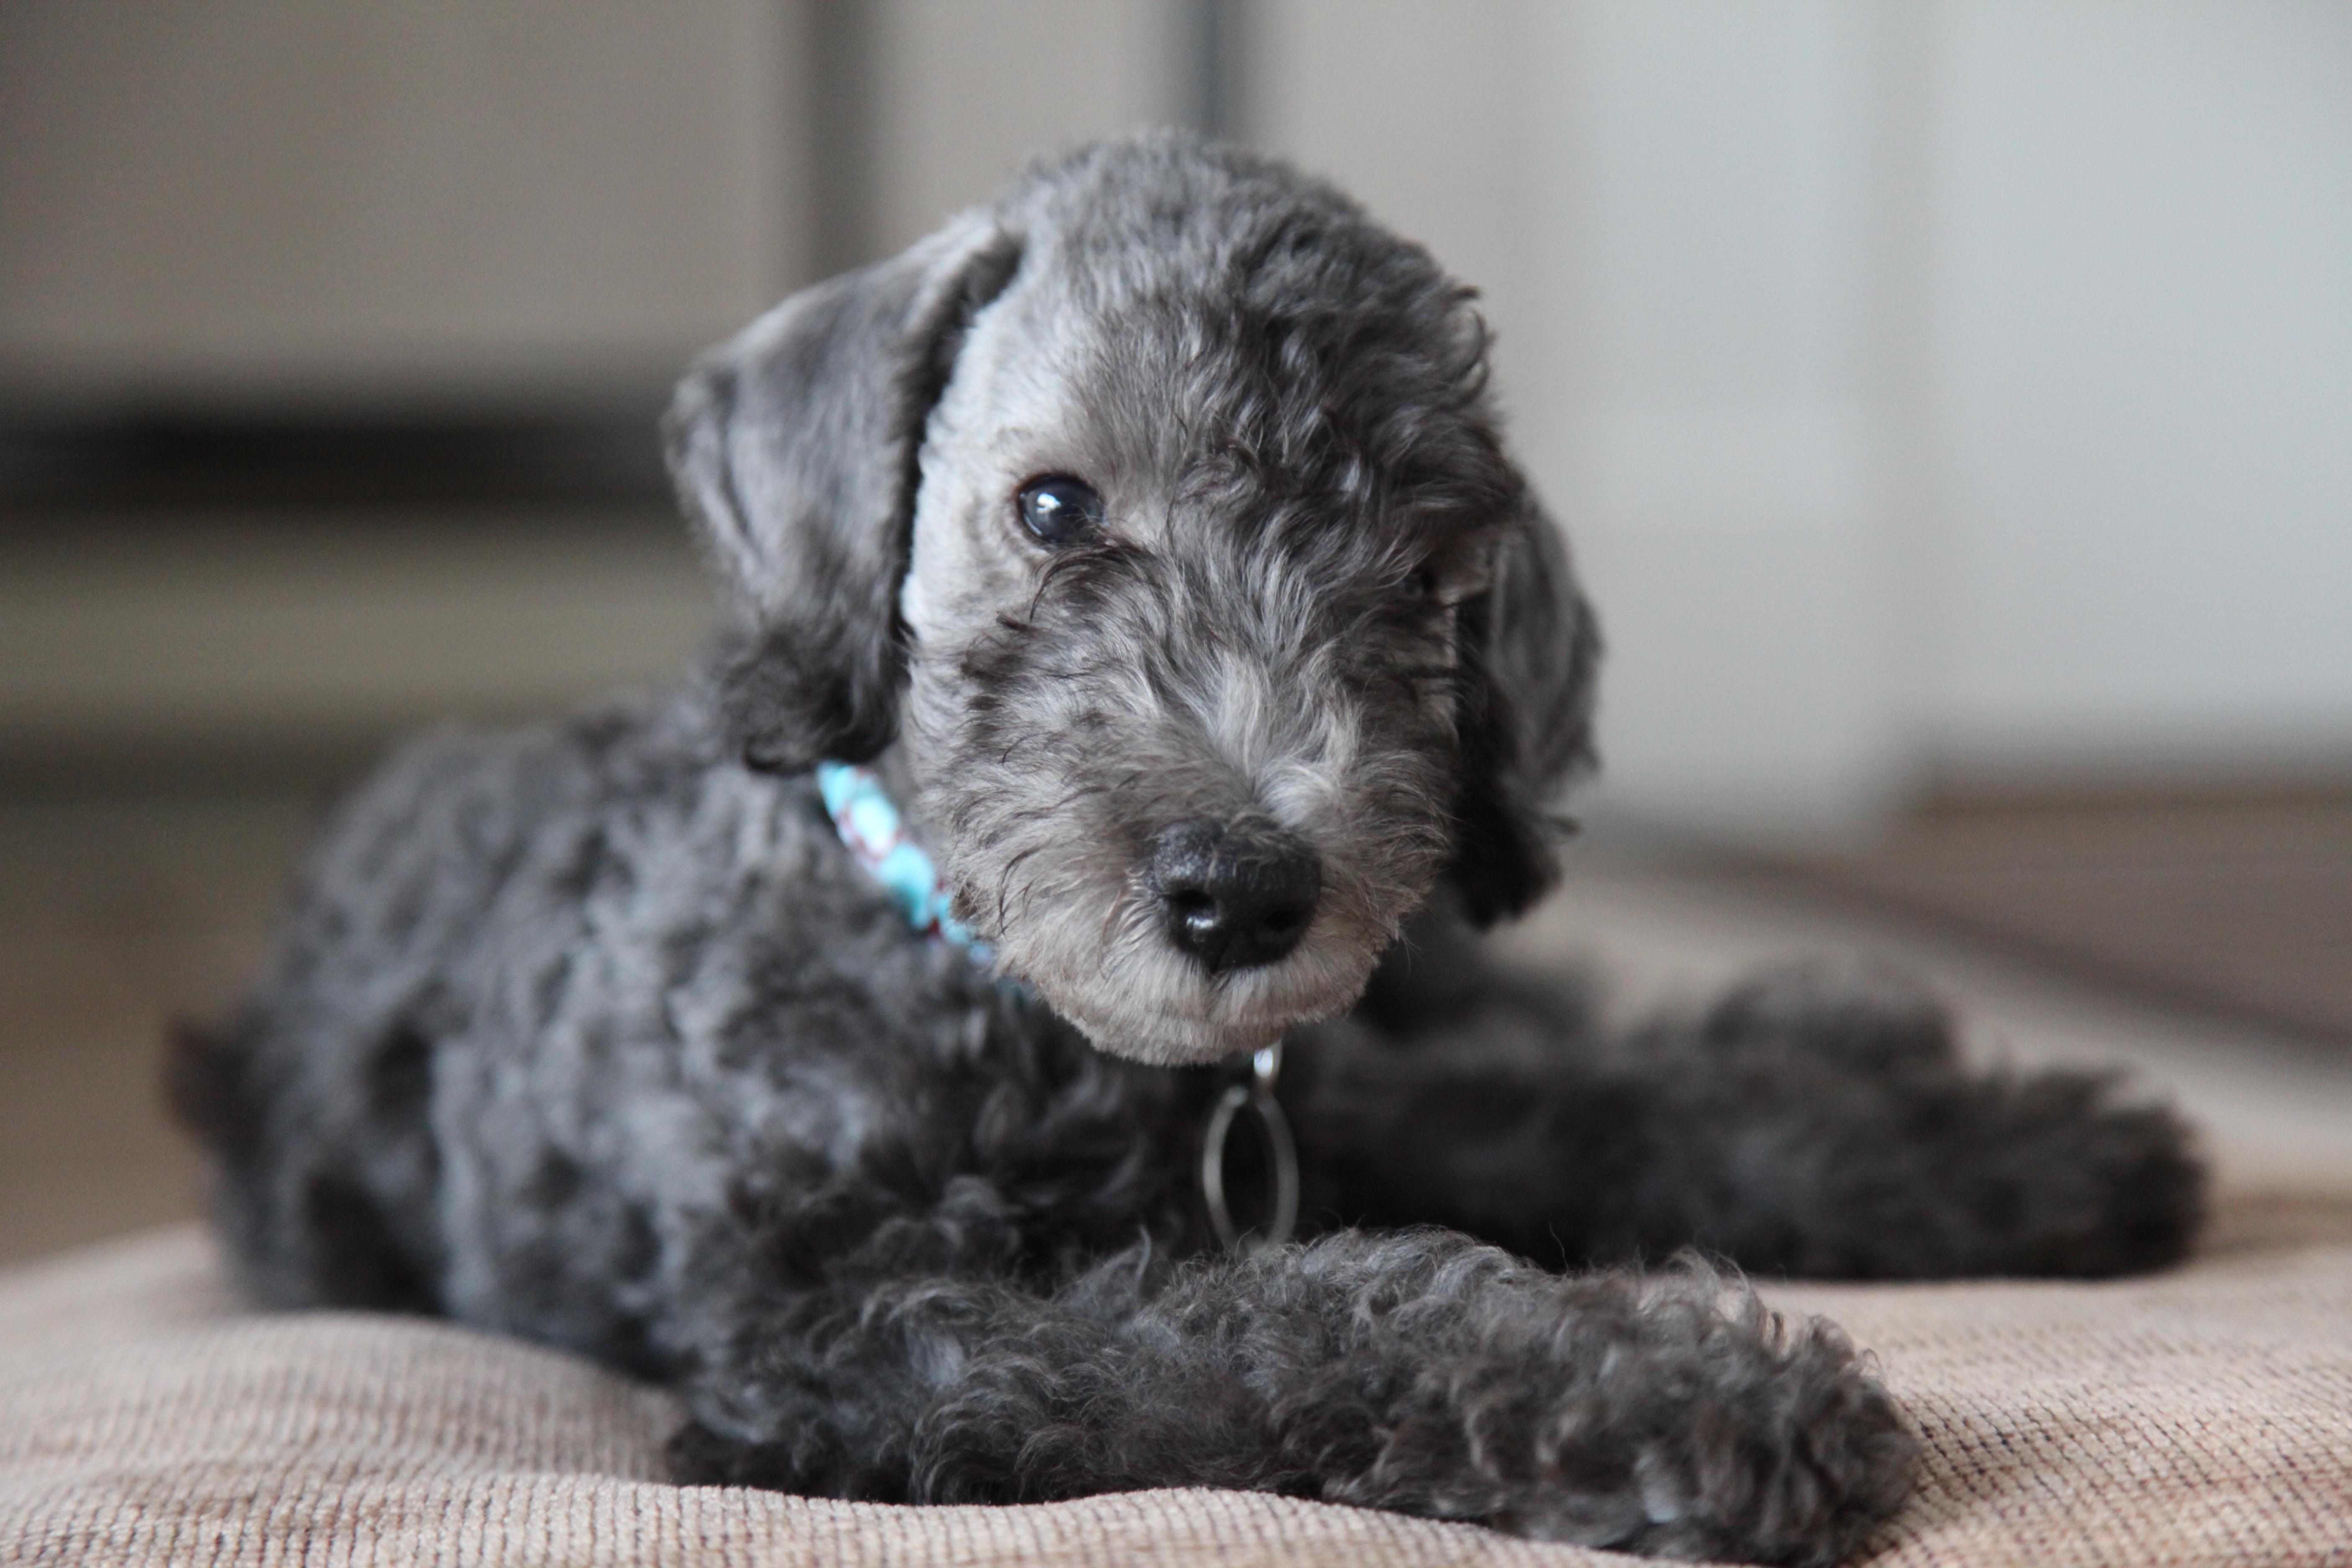 Bedlington Terrier Pictures Dogs